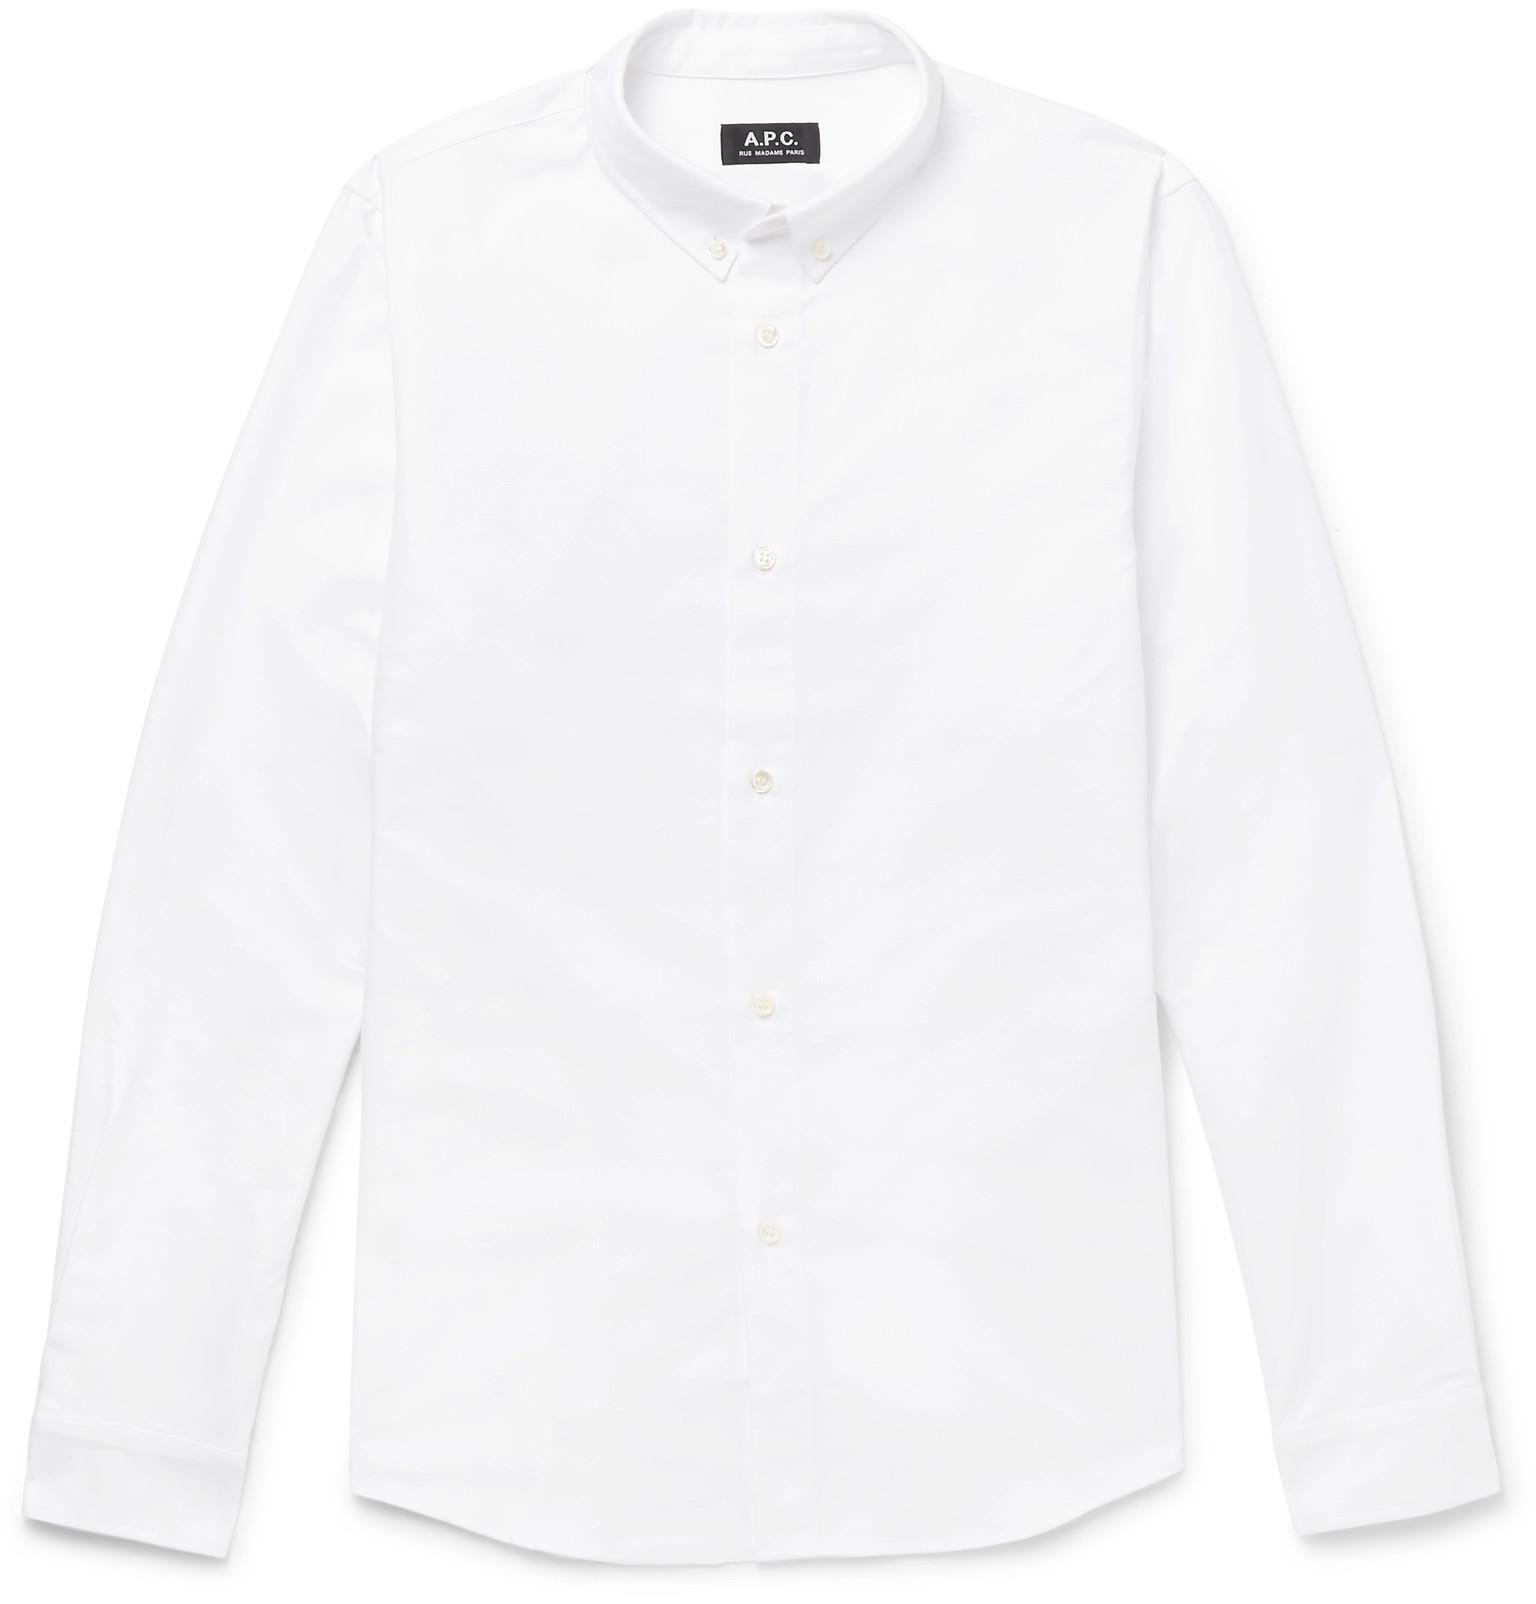 Apc Slim Fit Button Down Collar Cotton Oxford Shirt